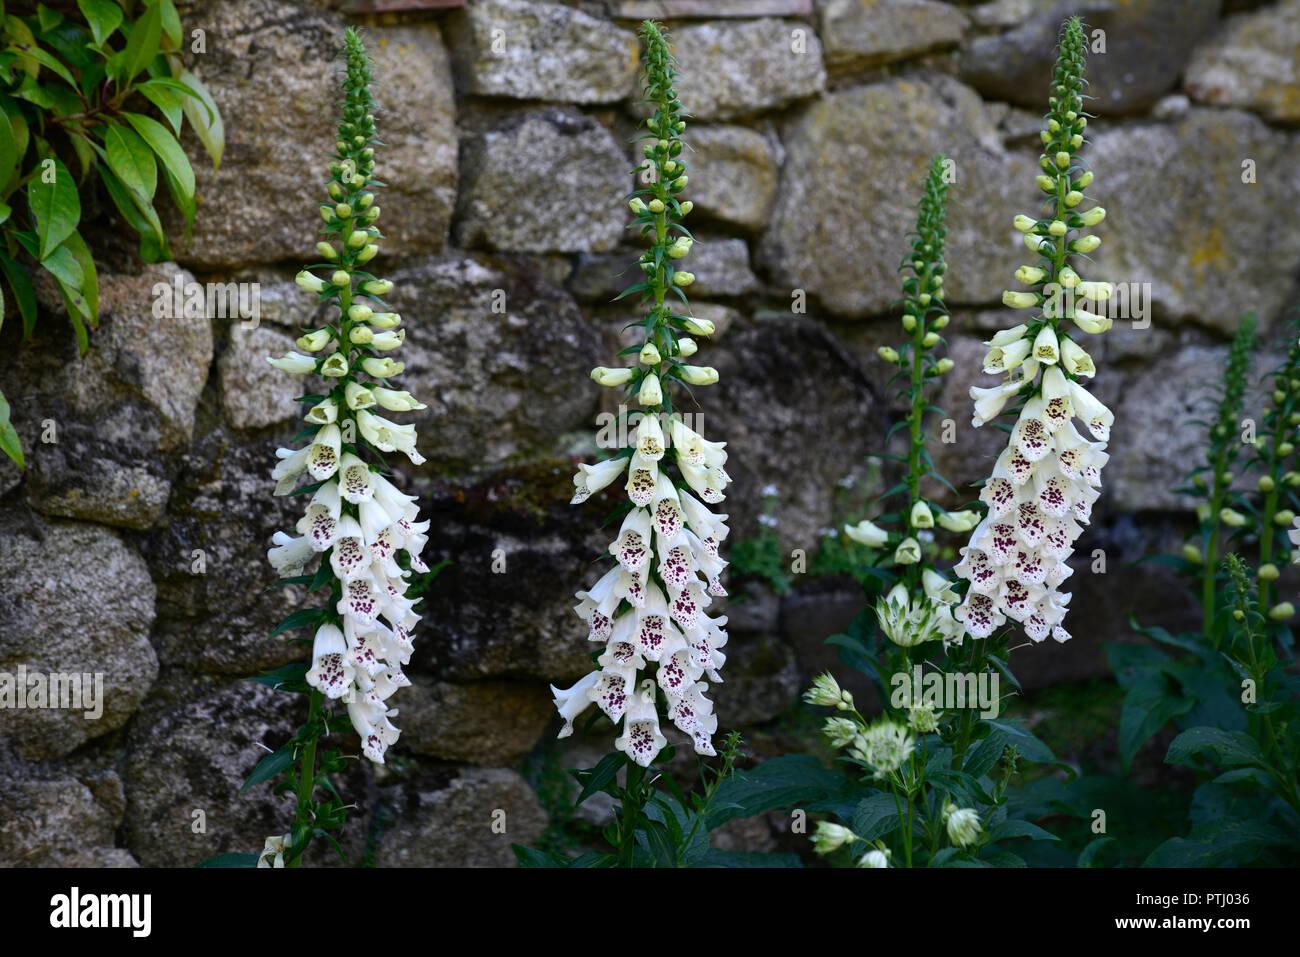 Digitalis Dalmatian White F1 Hybrid,white,spotted,speckled,flower,flowers,spike,spikes,spire,spires,garden,spring,RM Floral - Stock Image